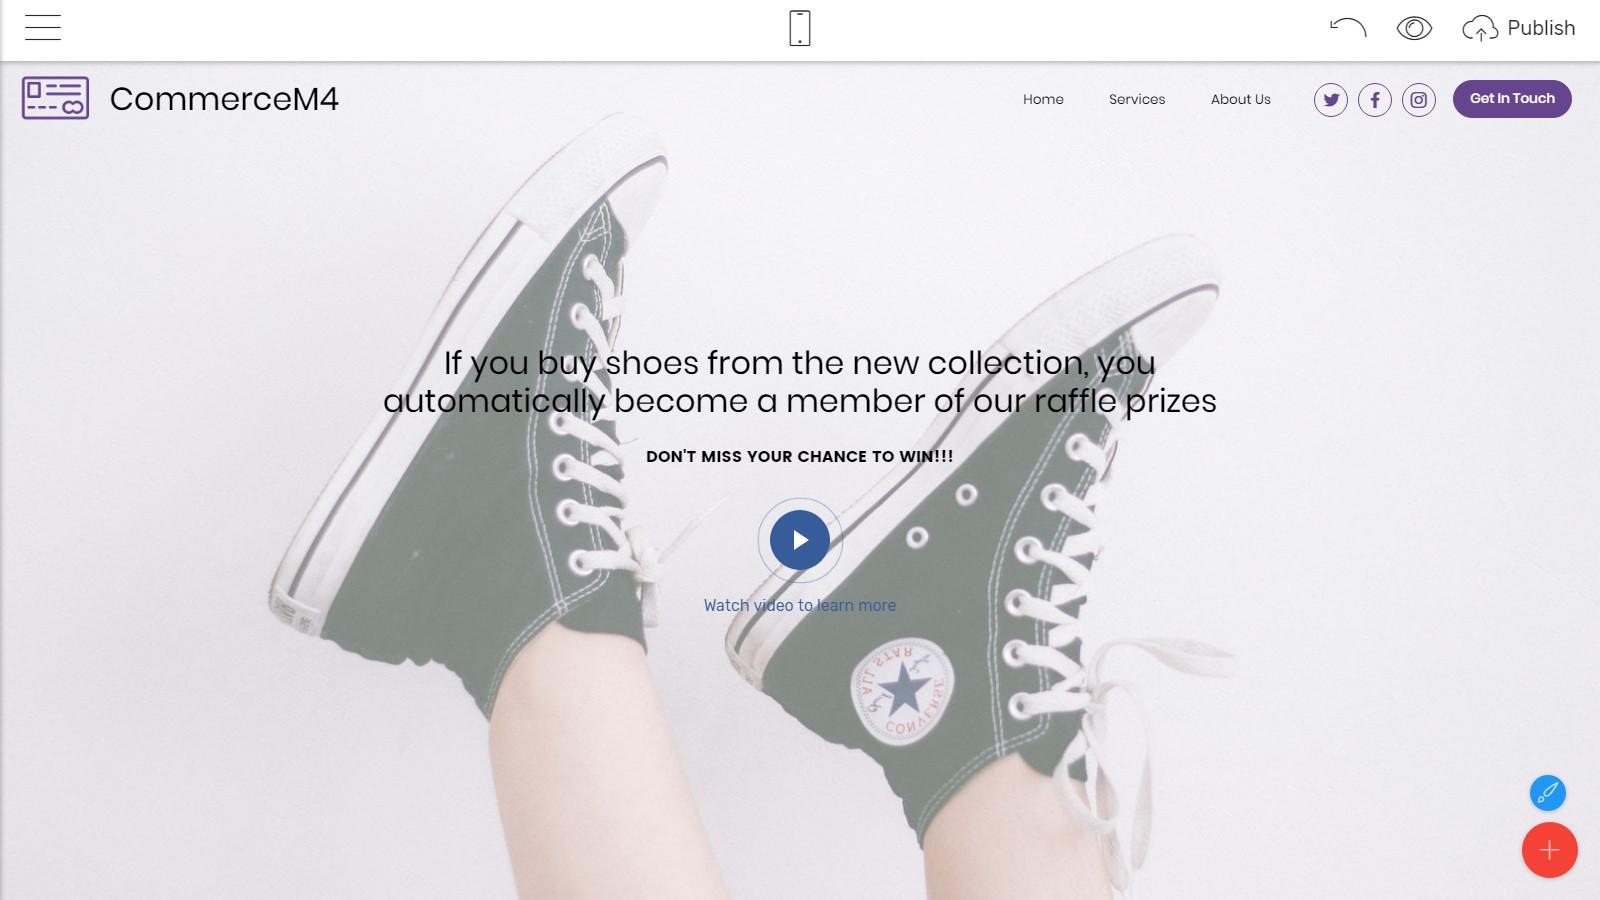 responsive webpage templates